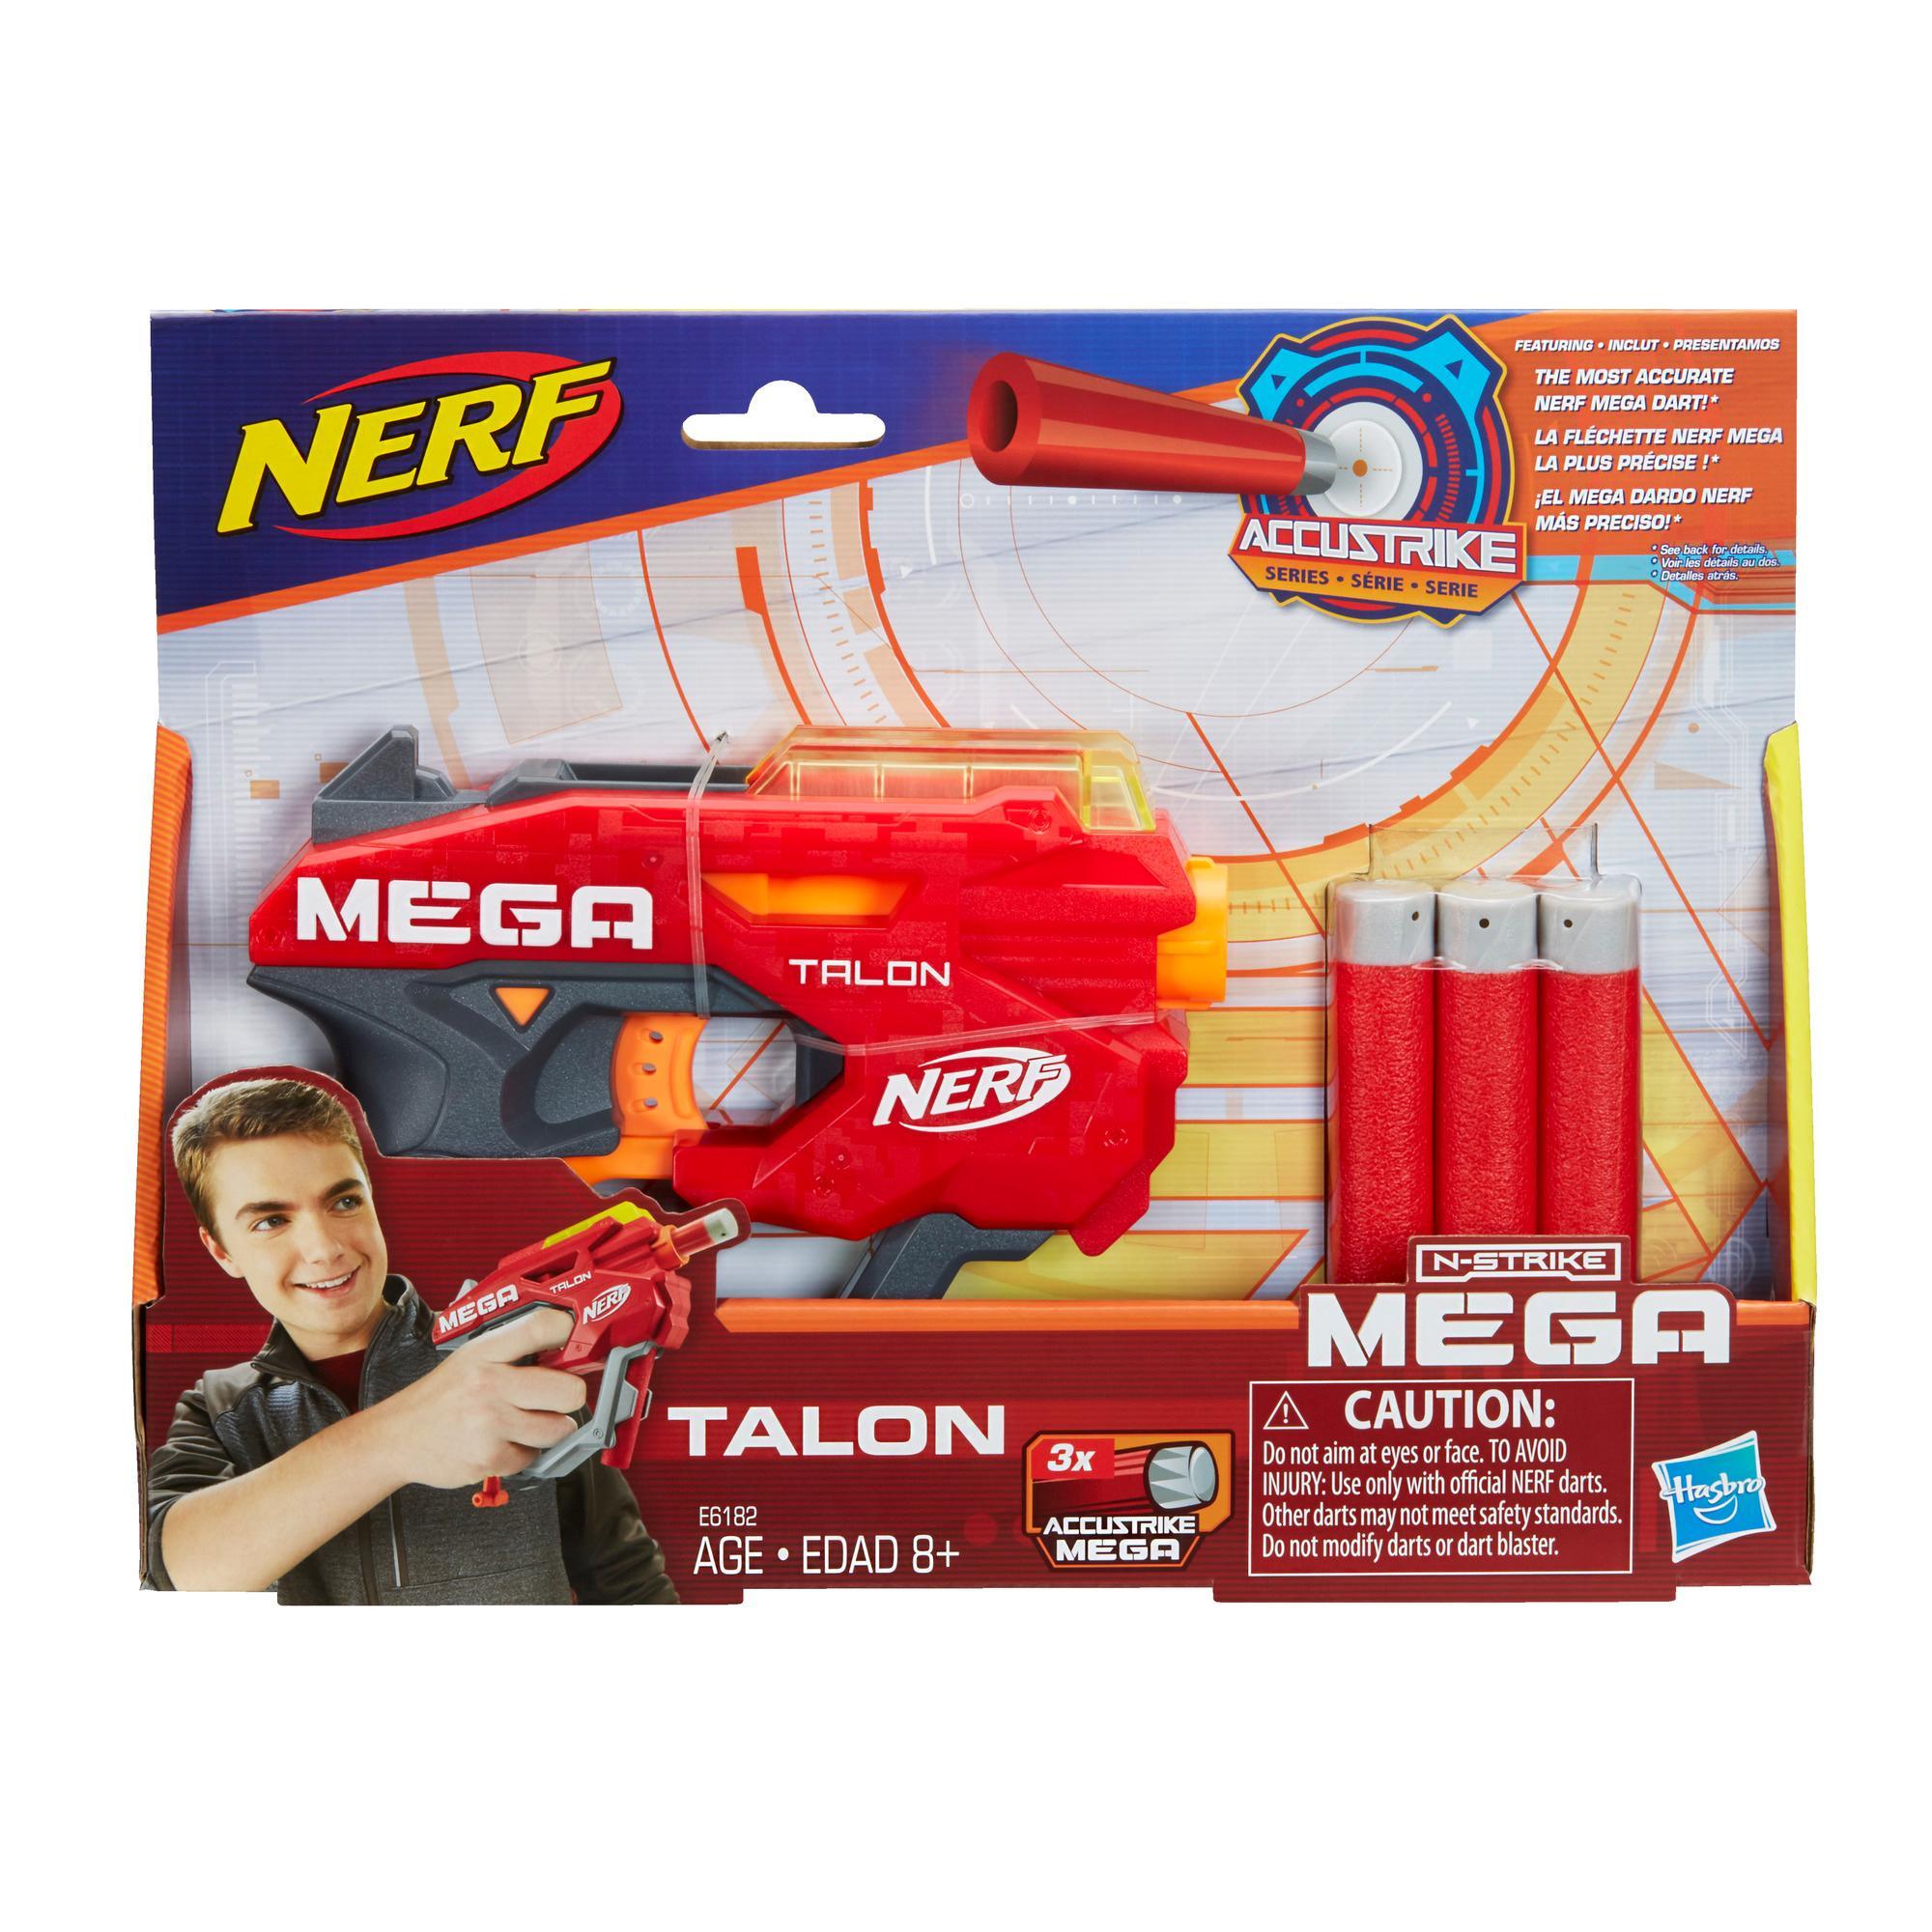 Nerf Mega Talon Blaster – enthält 3 AccuStrike Nerf Mega Darts – für Kinder, Teenager, Erwachsene